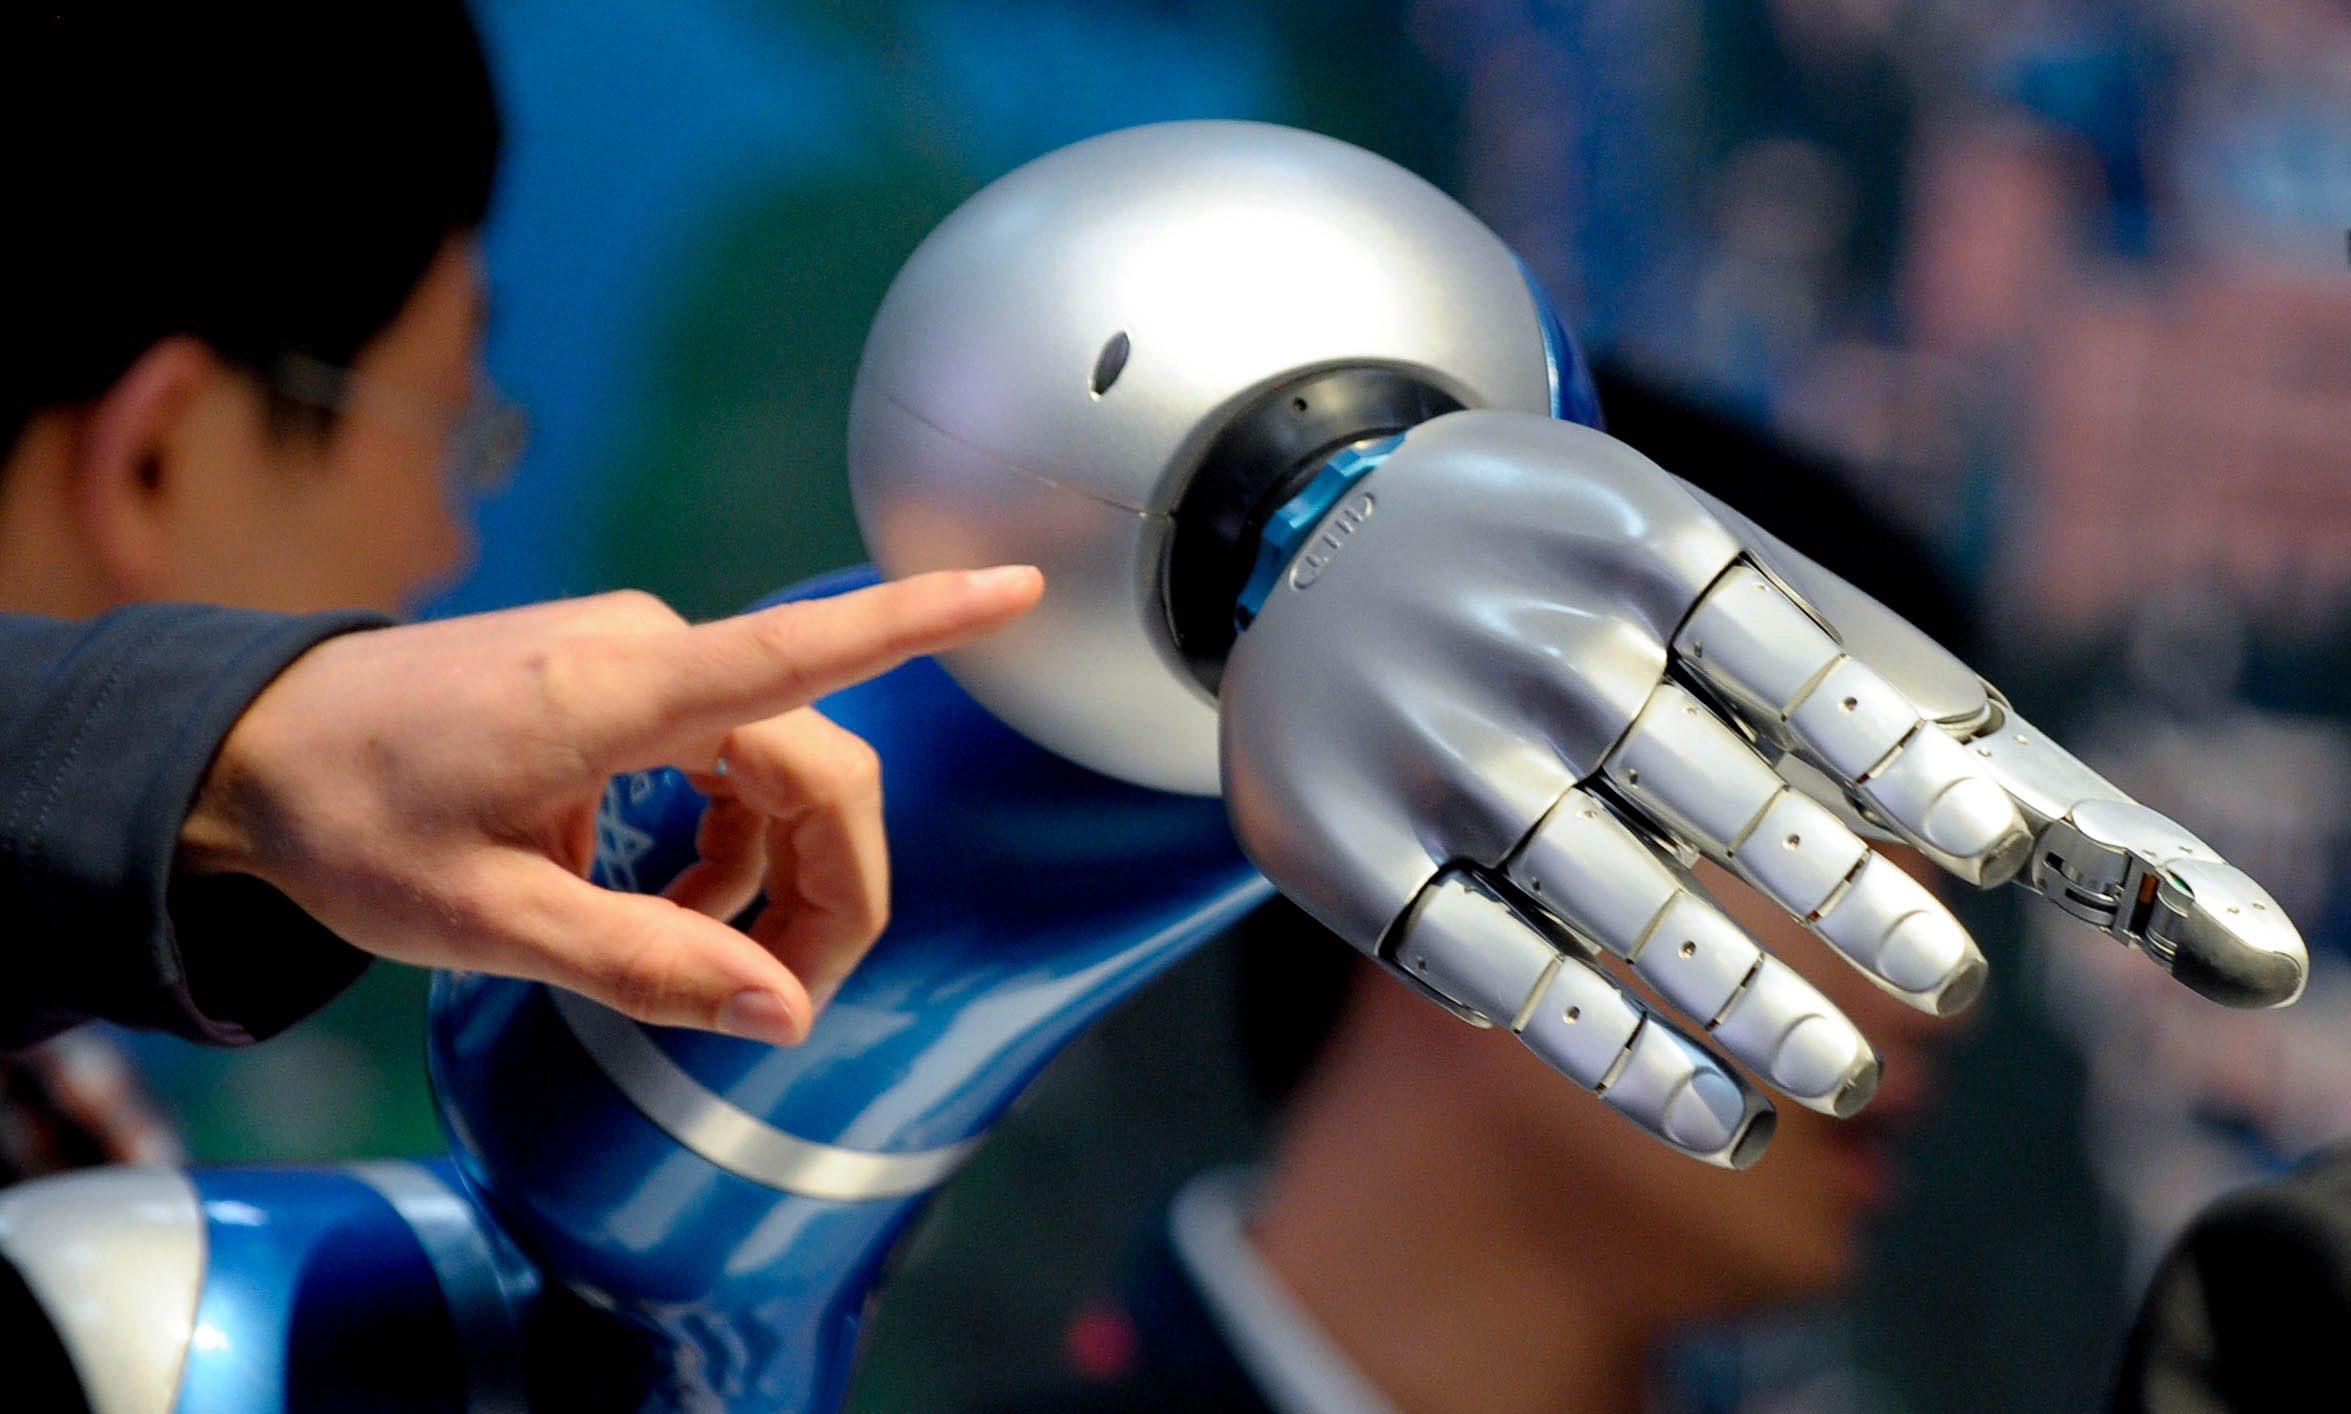 chinas high tech future emerges - HD2351×1414